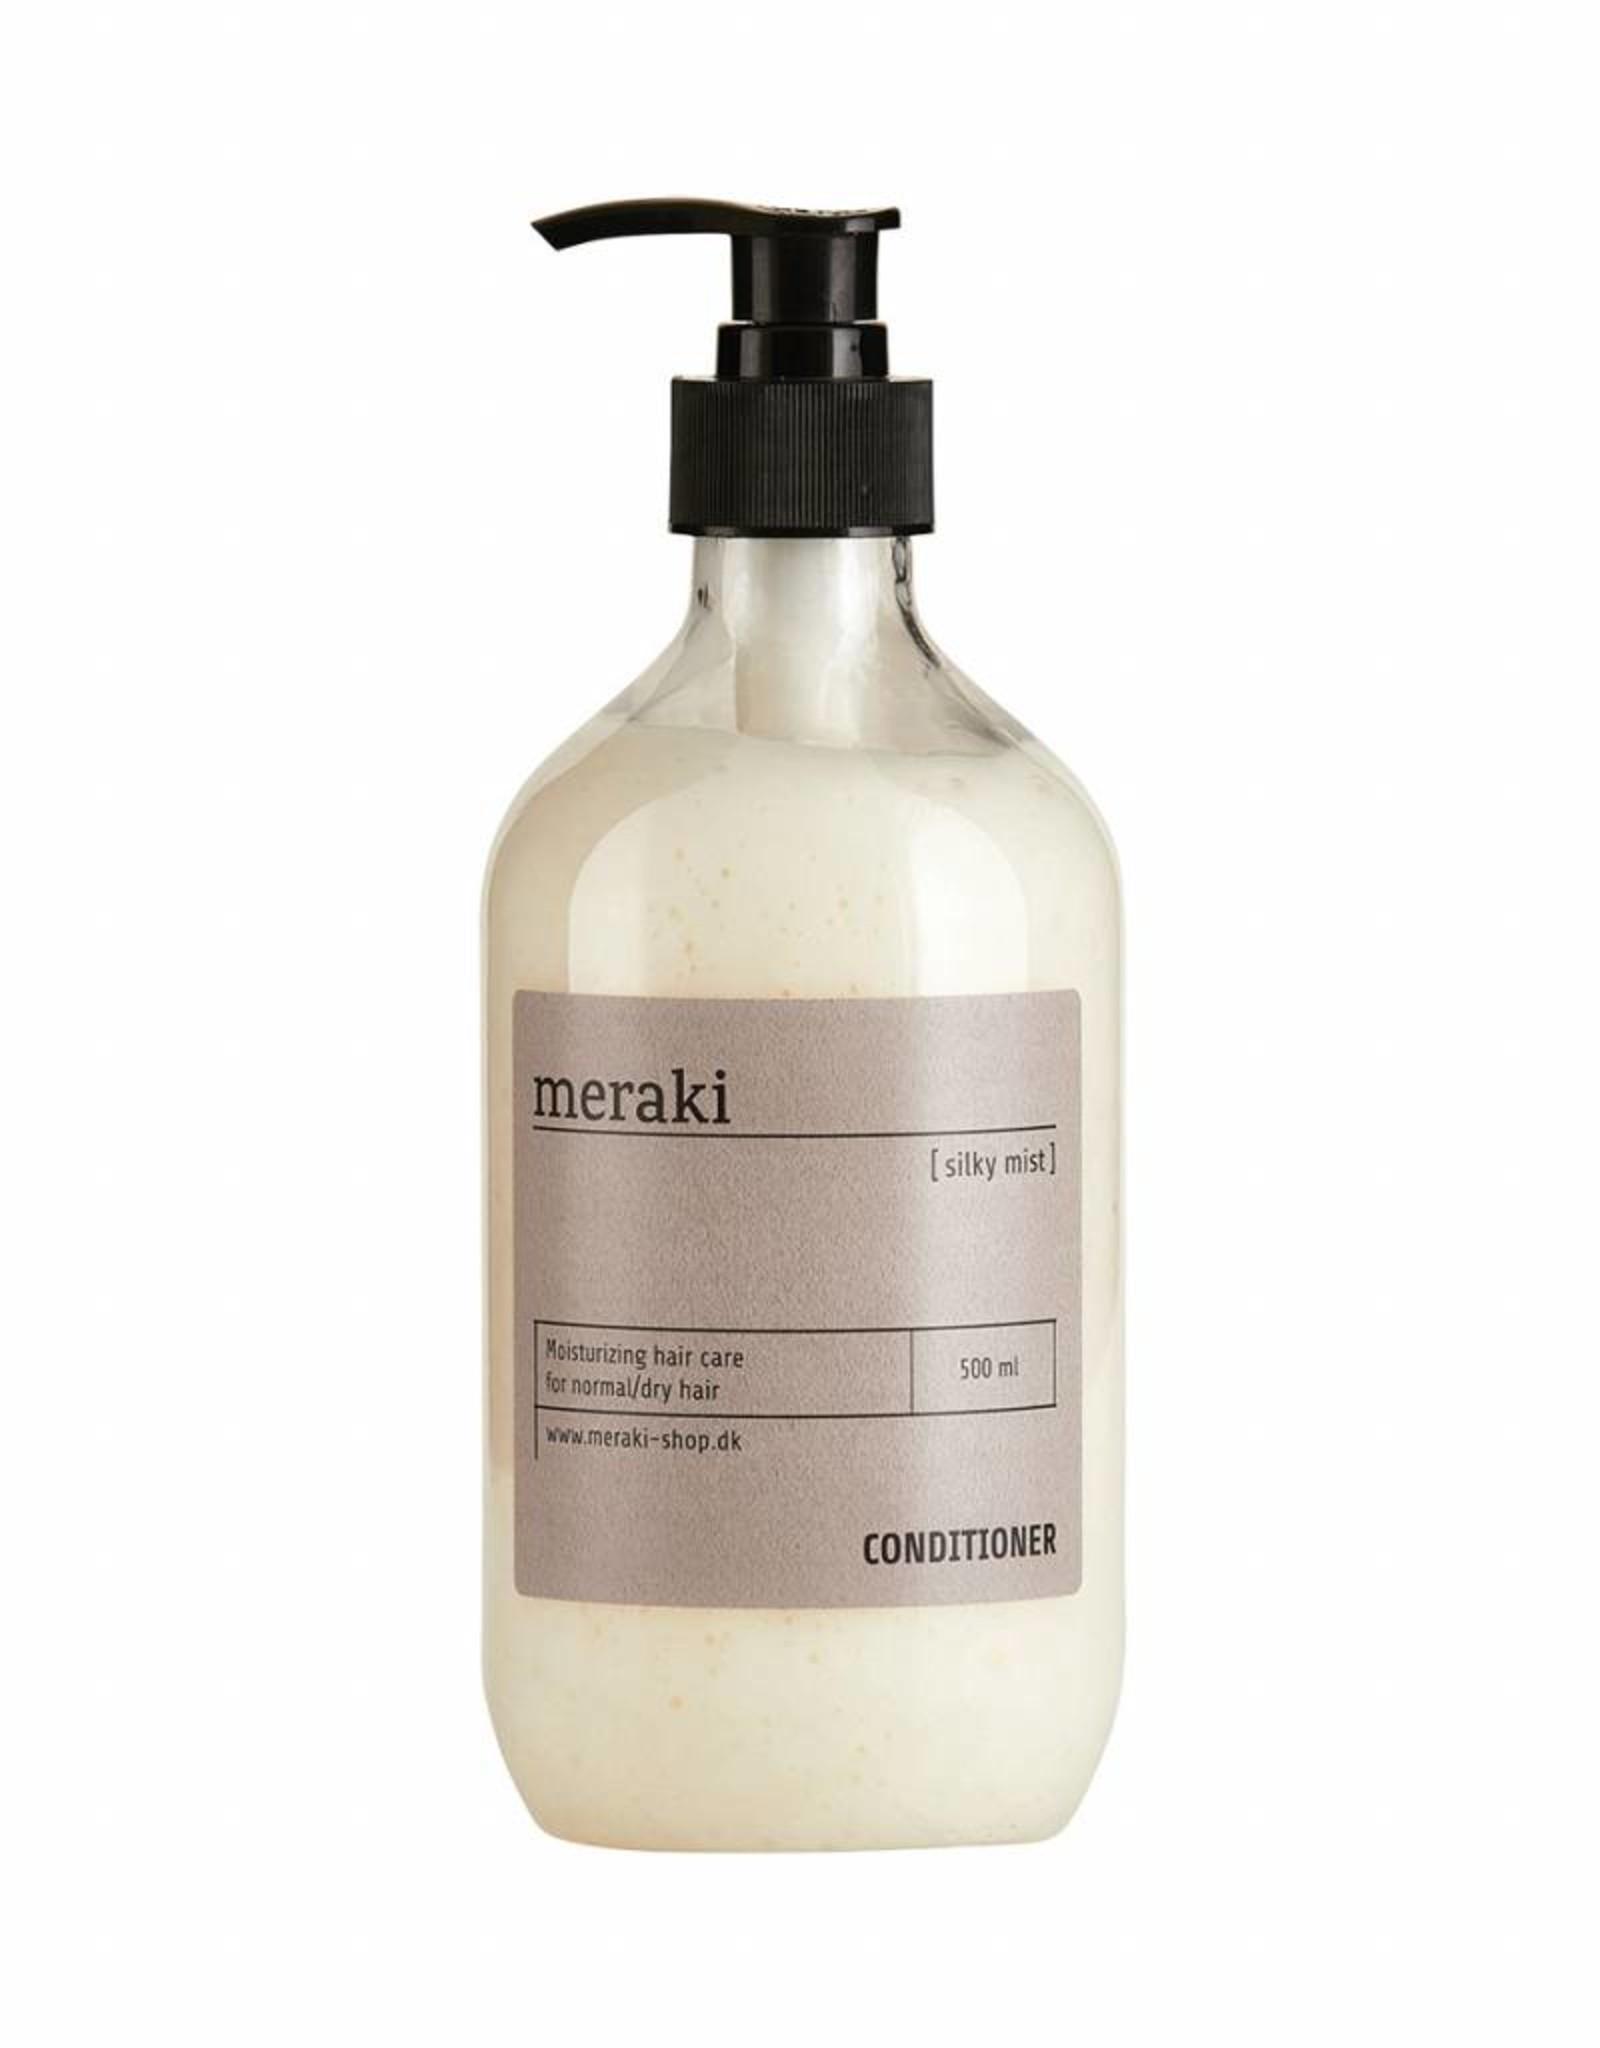 Meraki - Conditioner Silky mist 500 ml